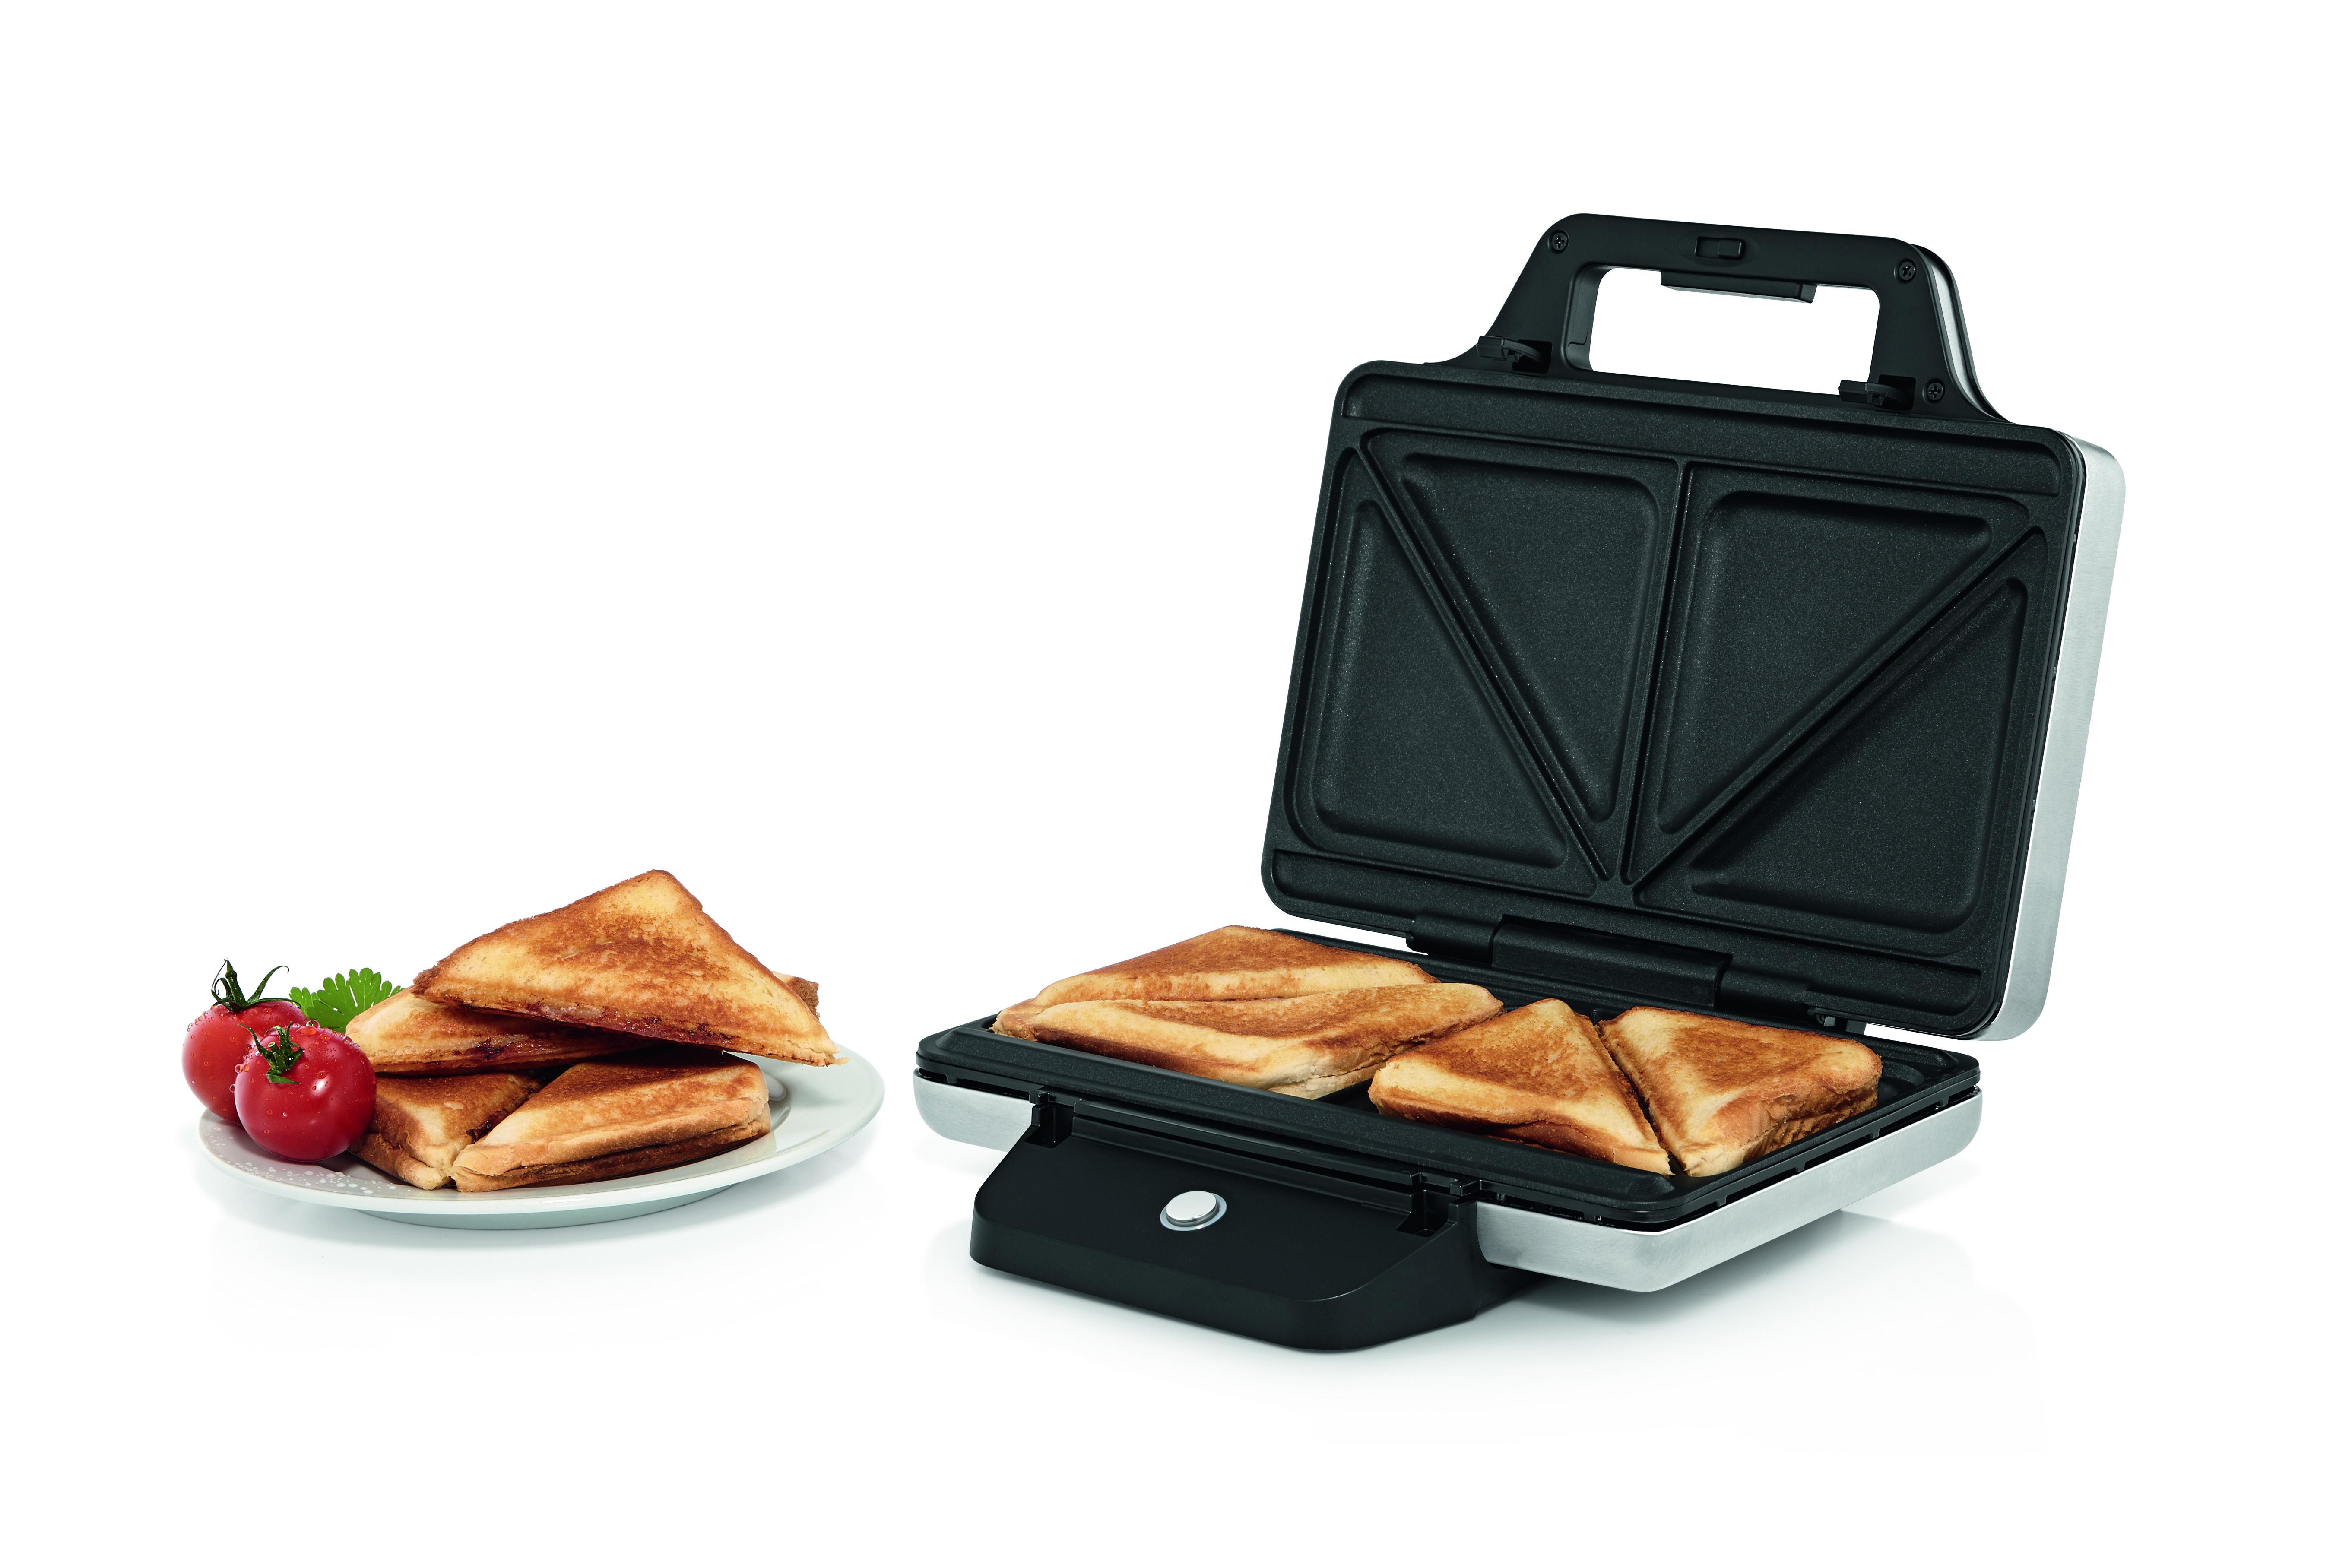 wmf lono sandwich toaster. Black Bedroom Furniture Sets. Home Design Ideas